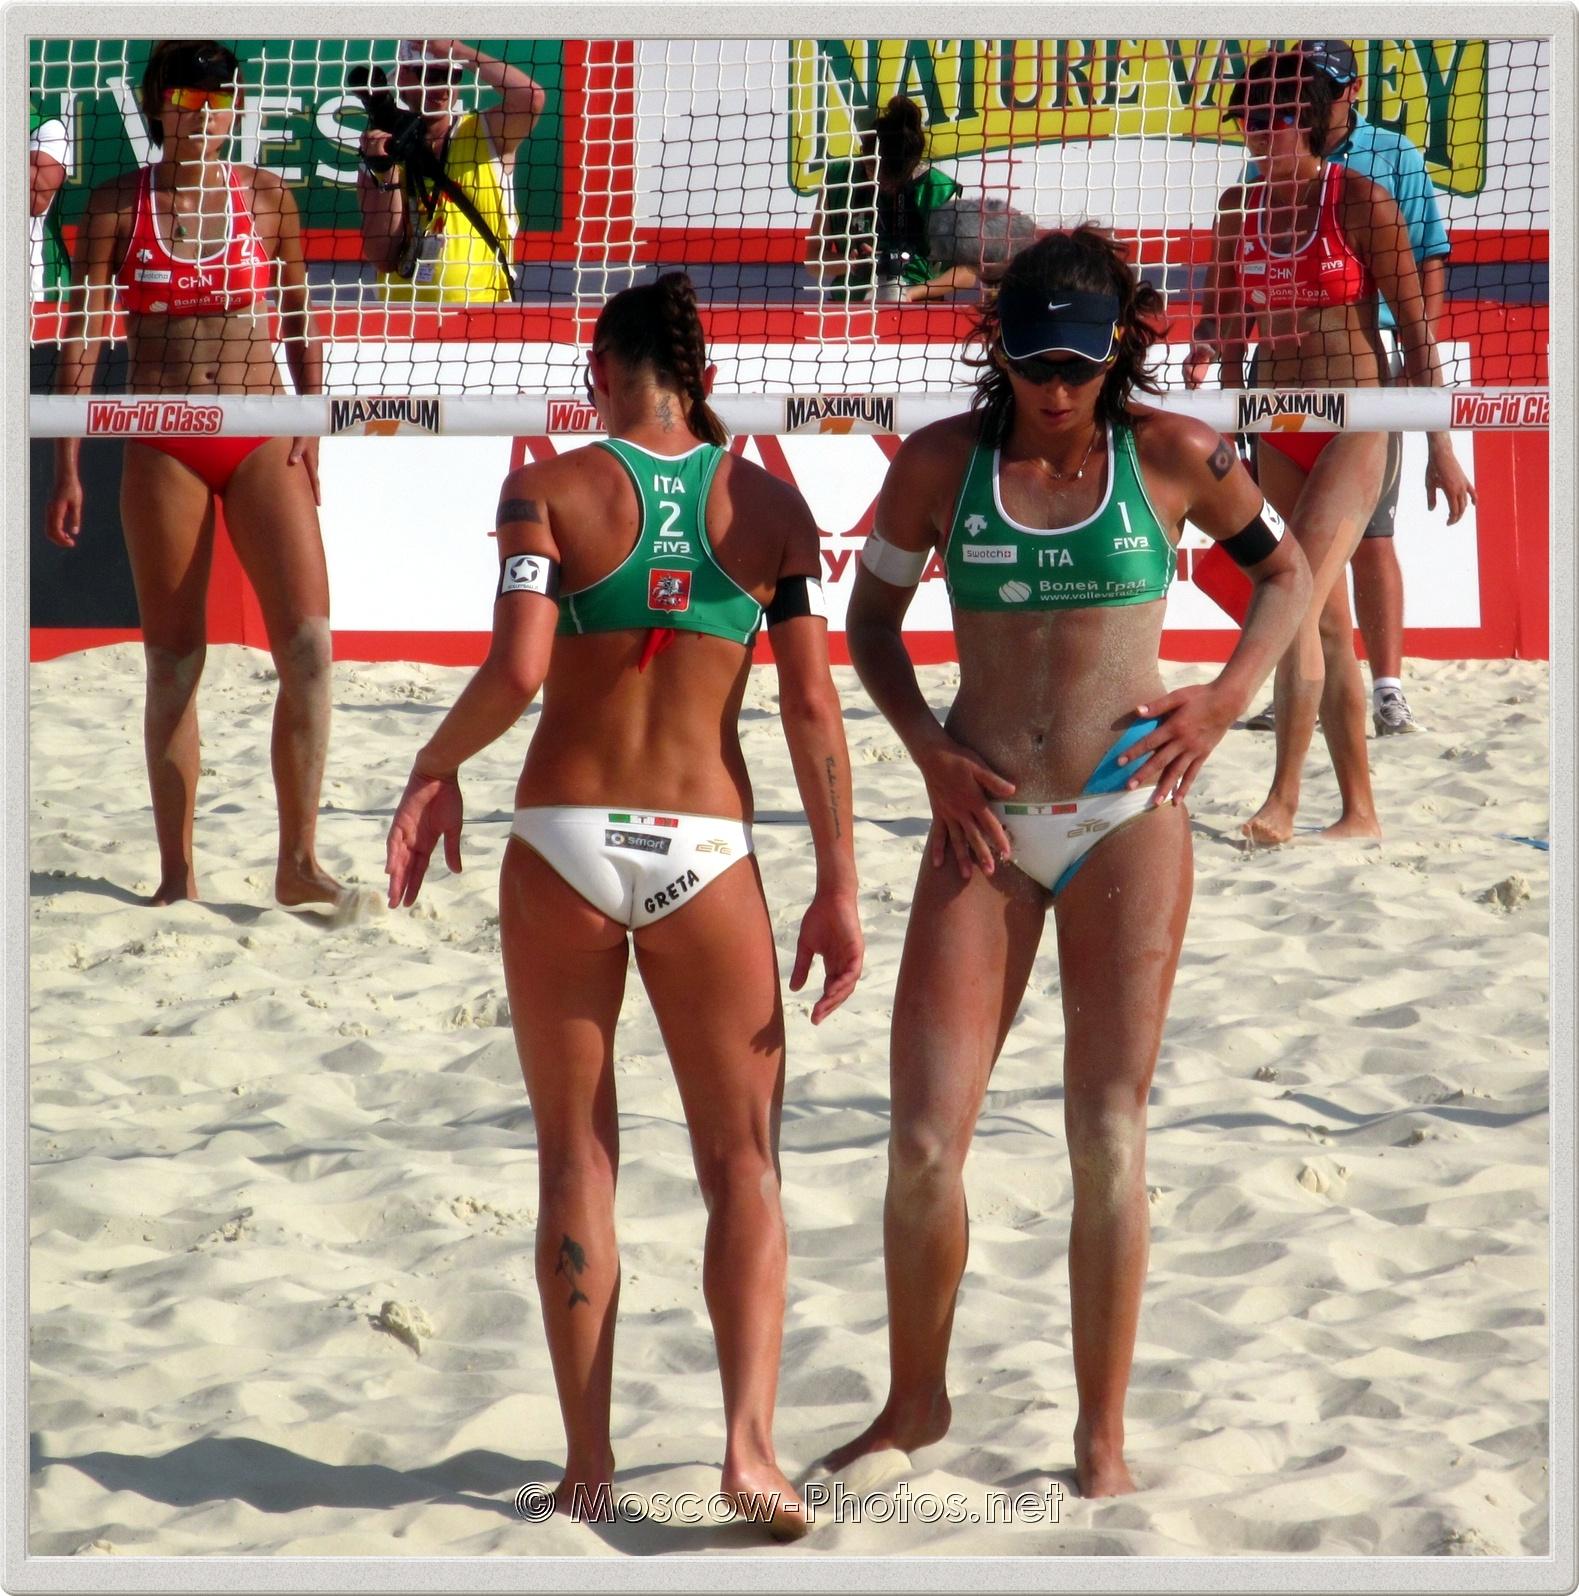 Italiian Team - Greta Cicolari & Marta Menegatti